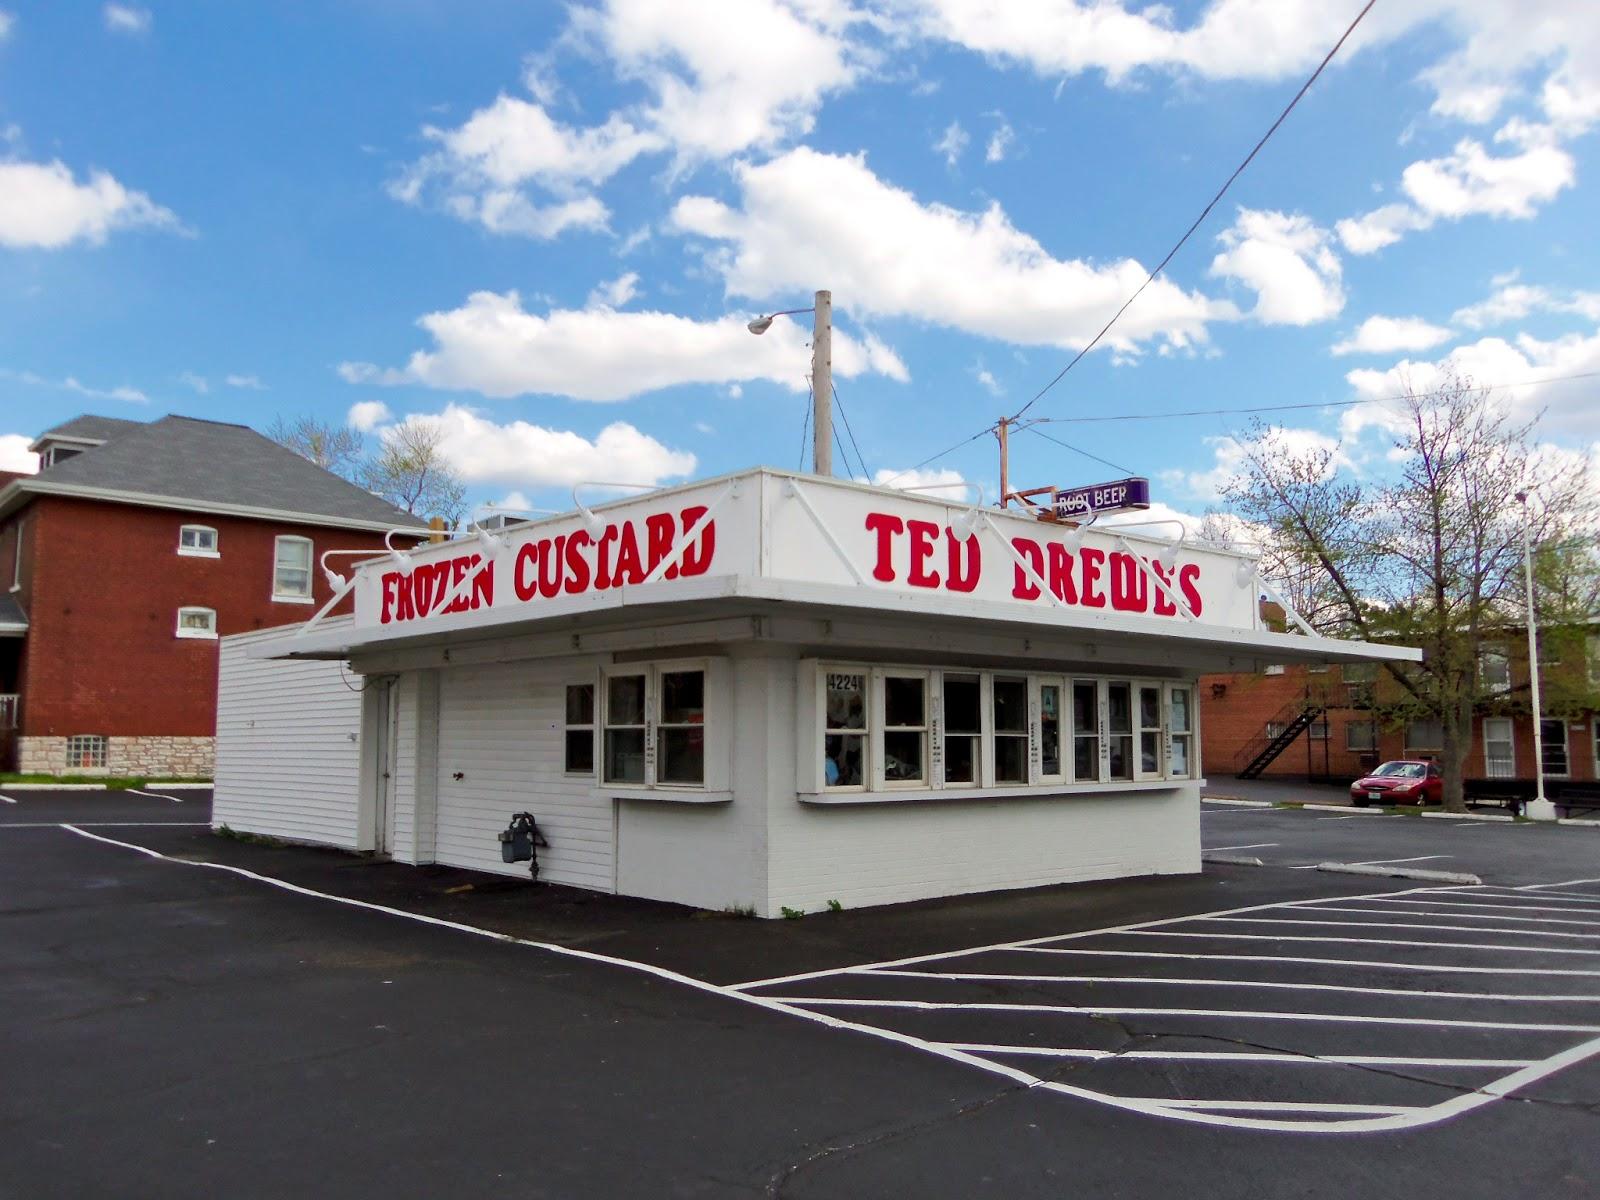 dak007@18p2p ... Ted Drewes Frozen Custard St. Louis